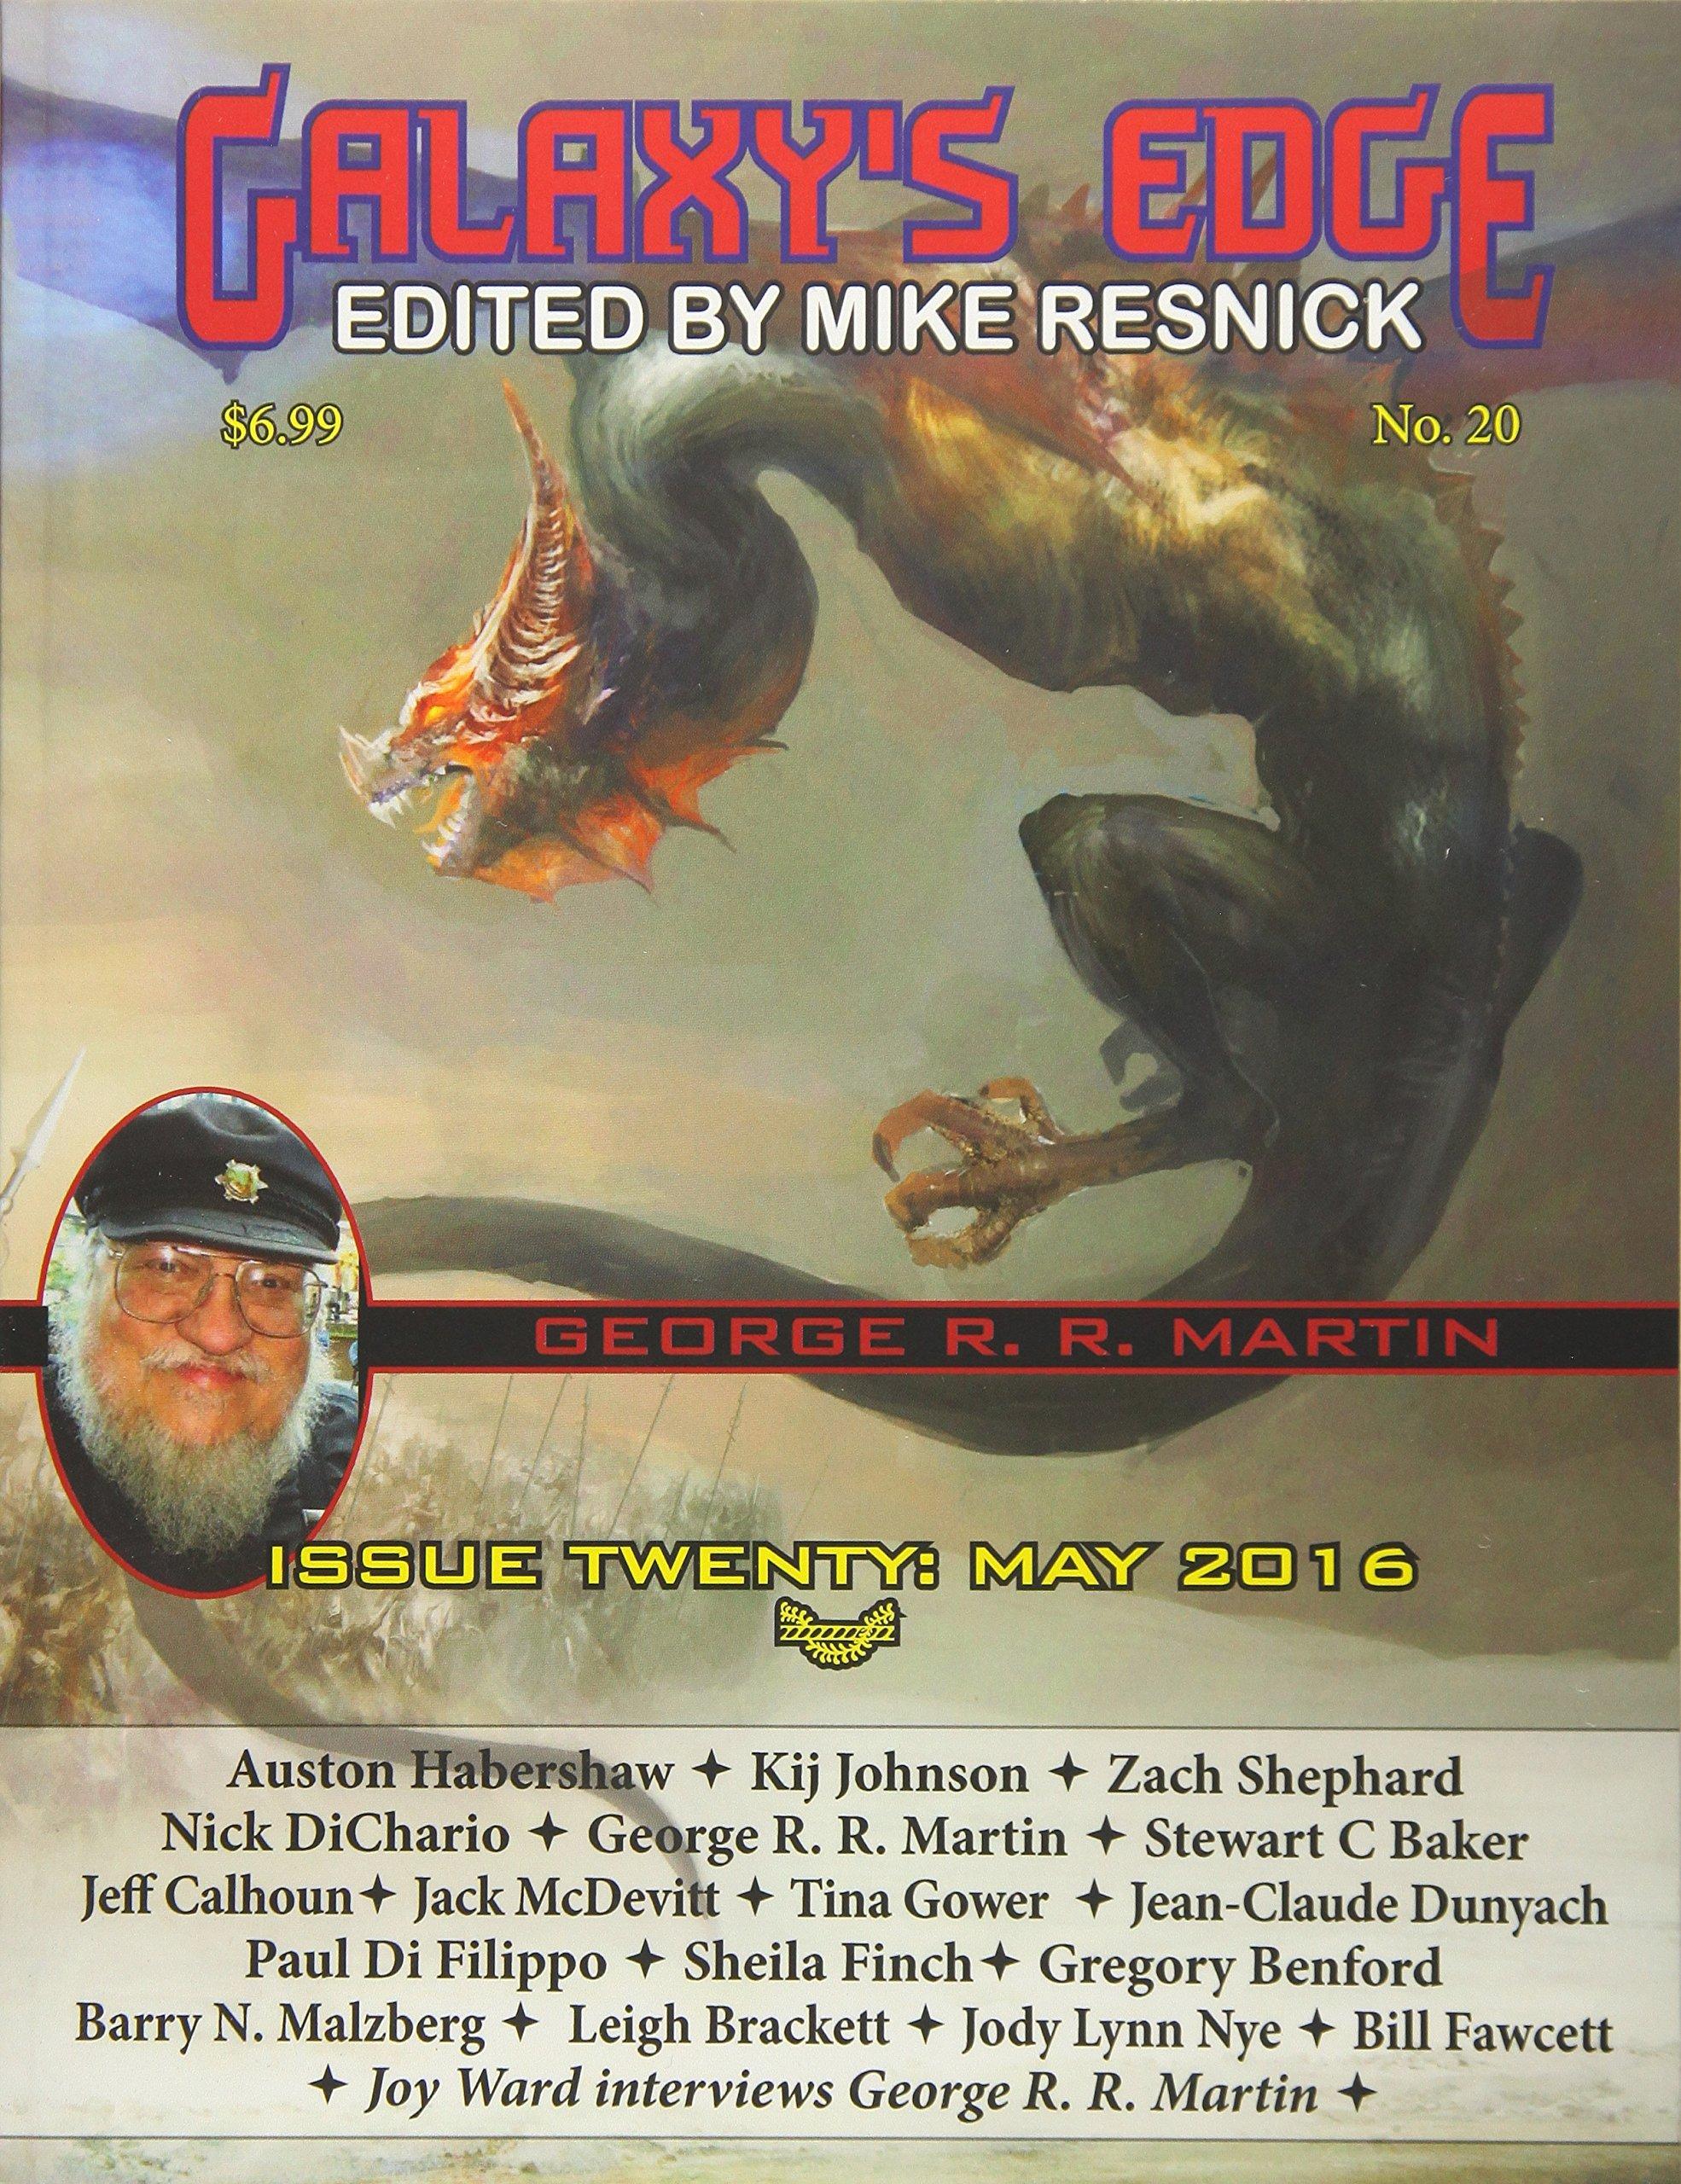 Galaxy's Edge Magazine: Issue 20, May 2016 (George R. R. Martin Special) (Volume 20) PDF